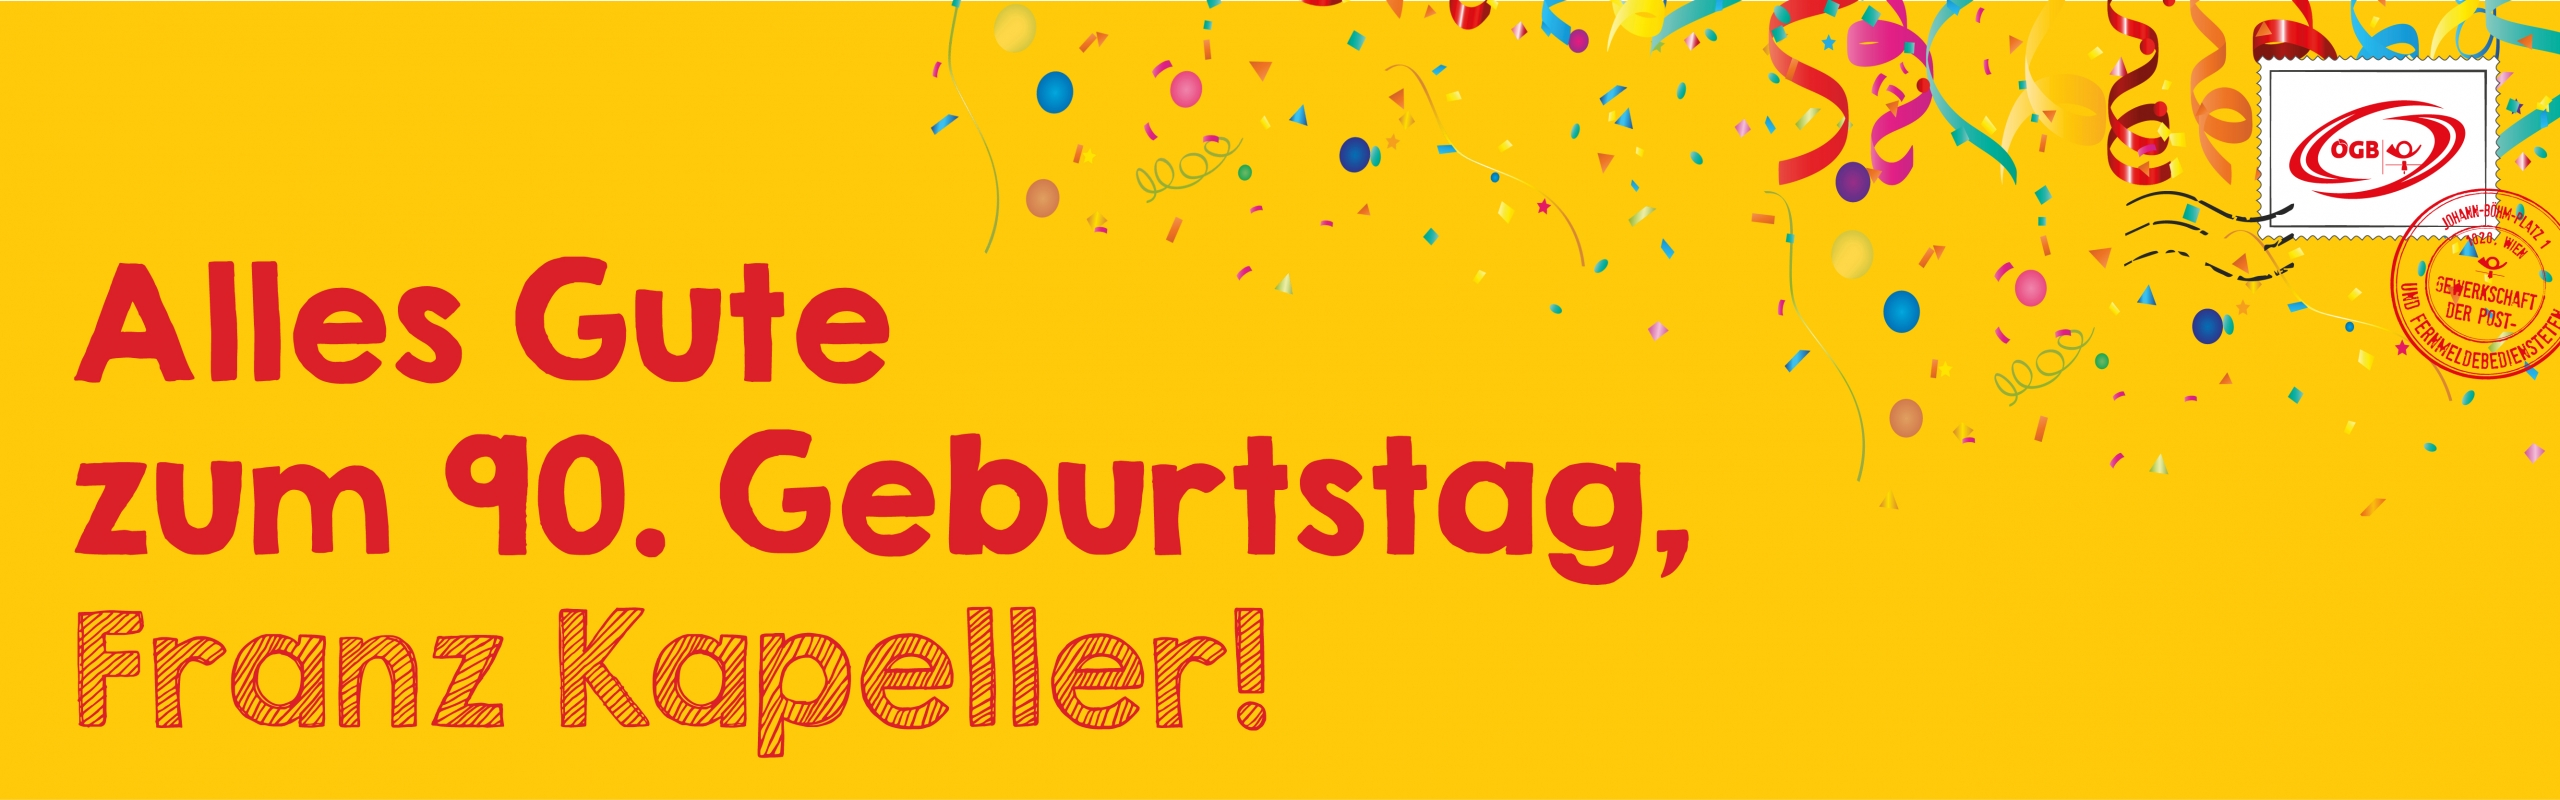 90 Geburtstag Kapeller_Banner